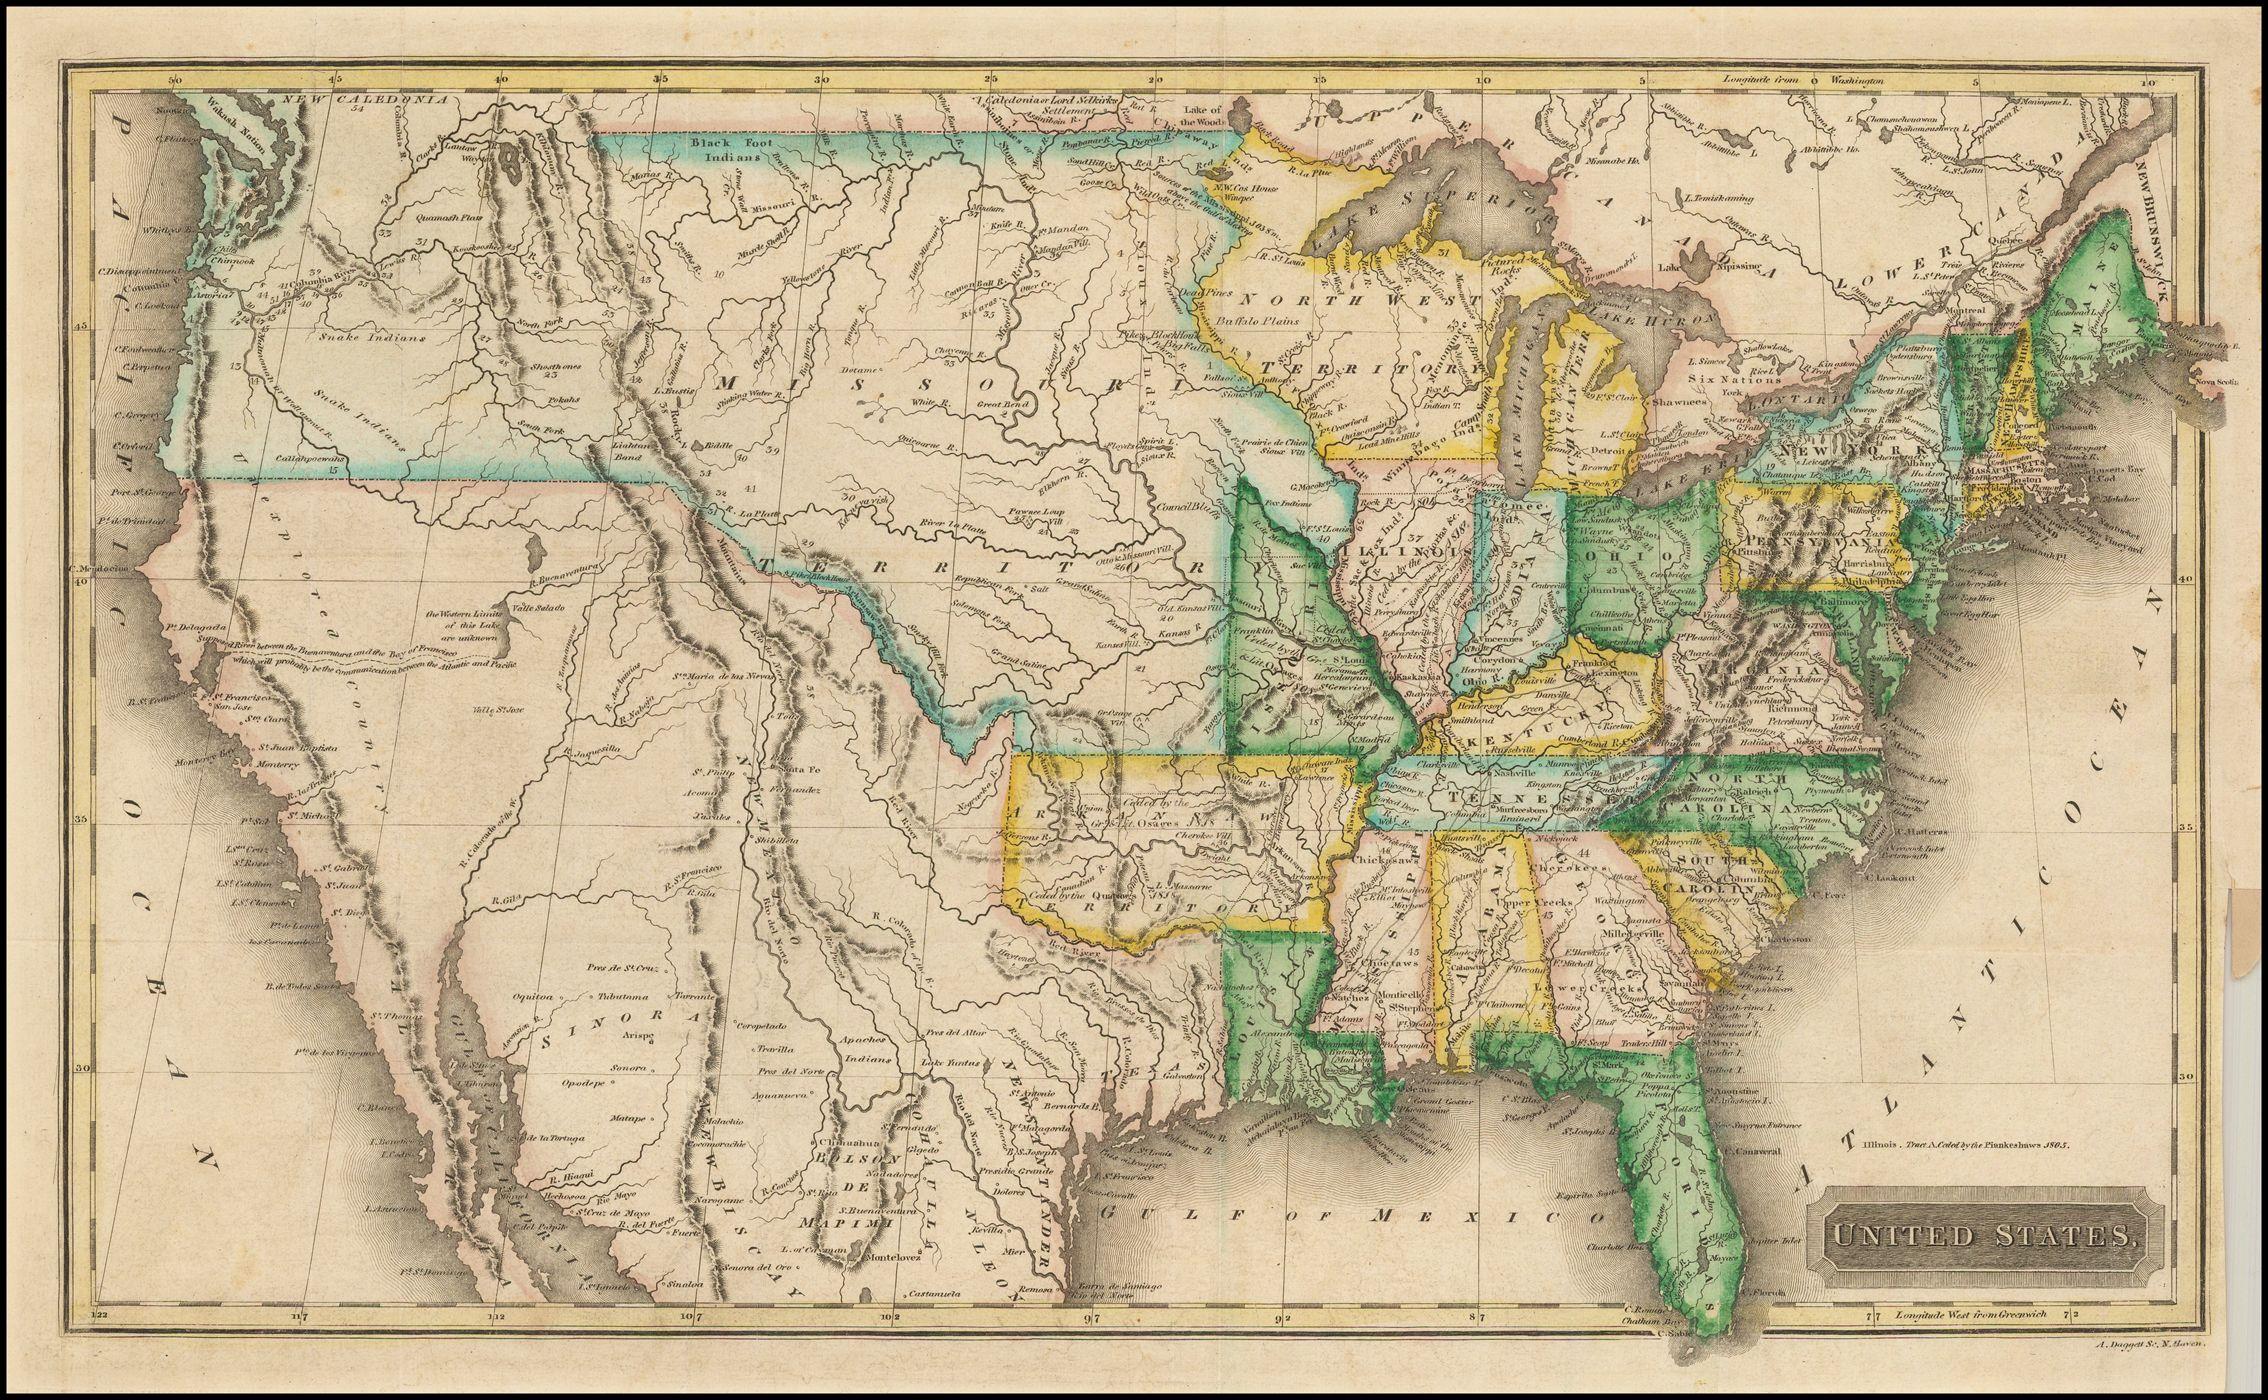 Map Of America 1820.United States Territory 1820 Map Usa America Interesting